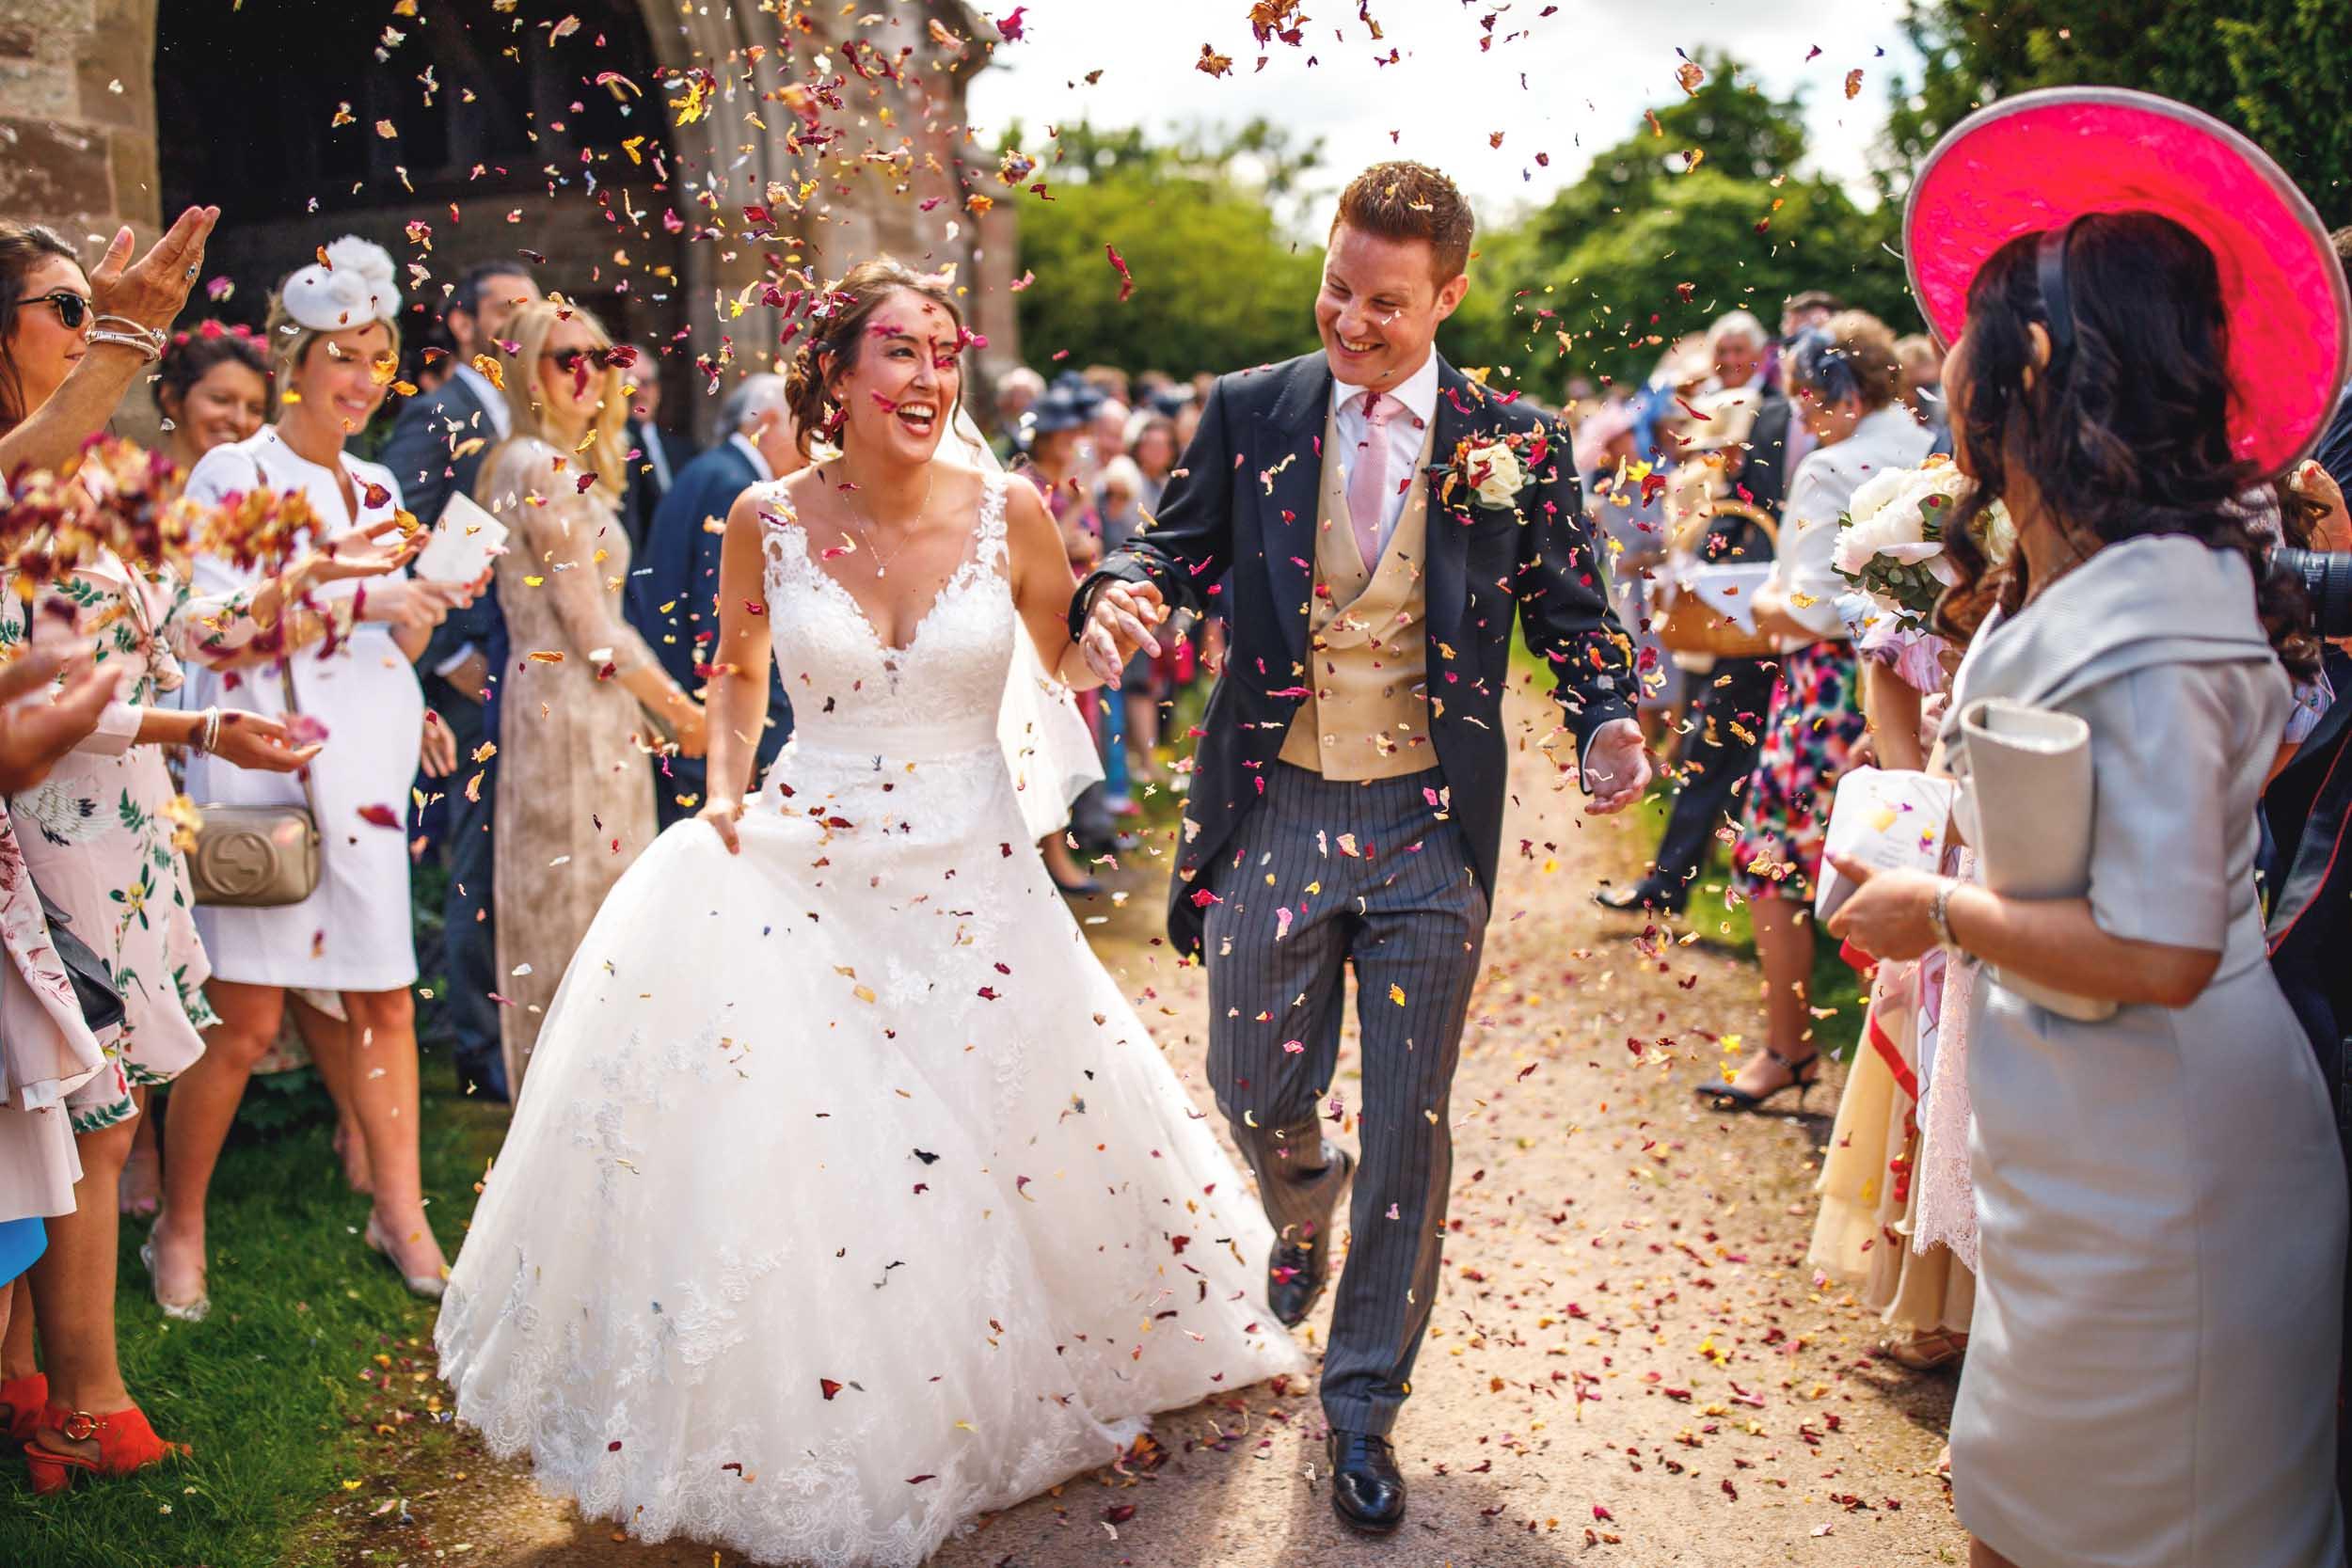 Herefordshire Wedding Photographer, Wedding Photographer in Herefordshire, Herefordshire, Wedding, Photographer, Wedding photography in herefordshire, Wedding photographers in Herefordshire